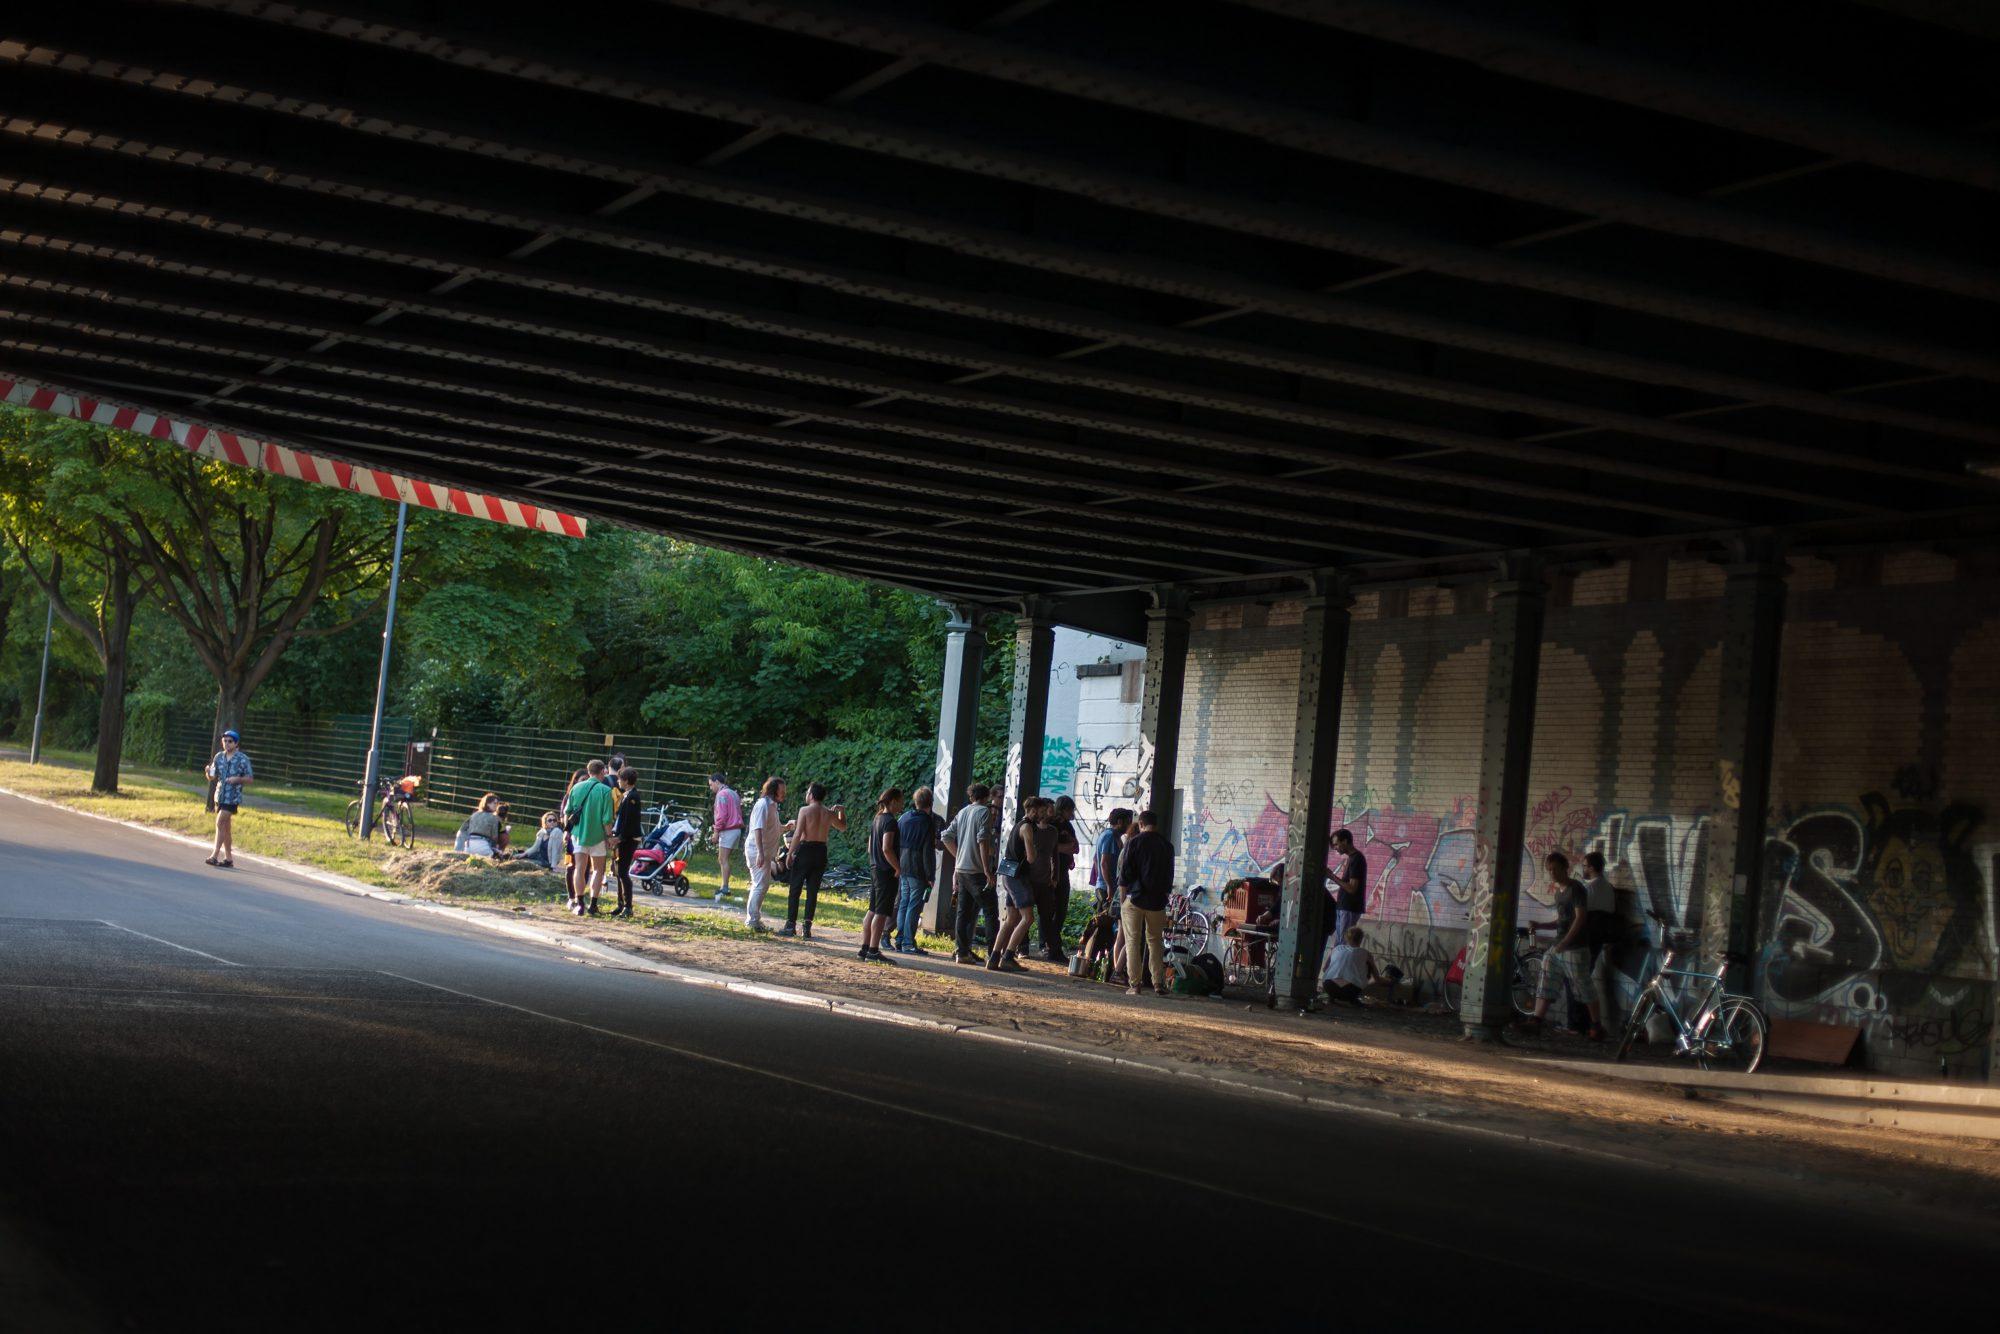 Kottbusserdamm Terror Corpse – Berlin, Germany – 2012